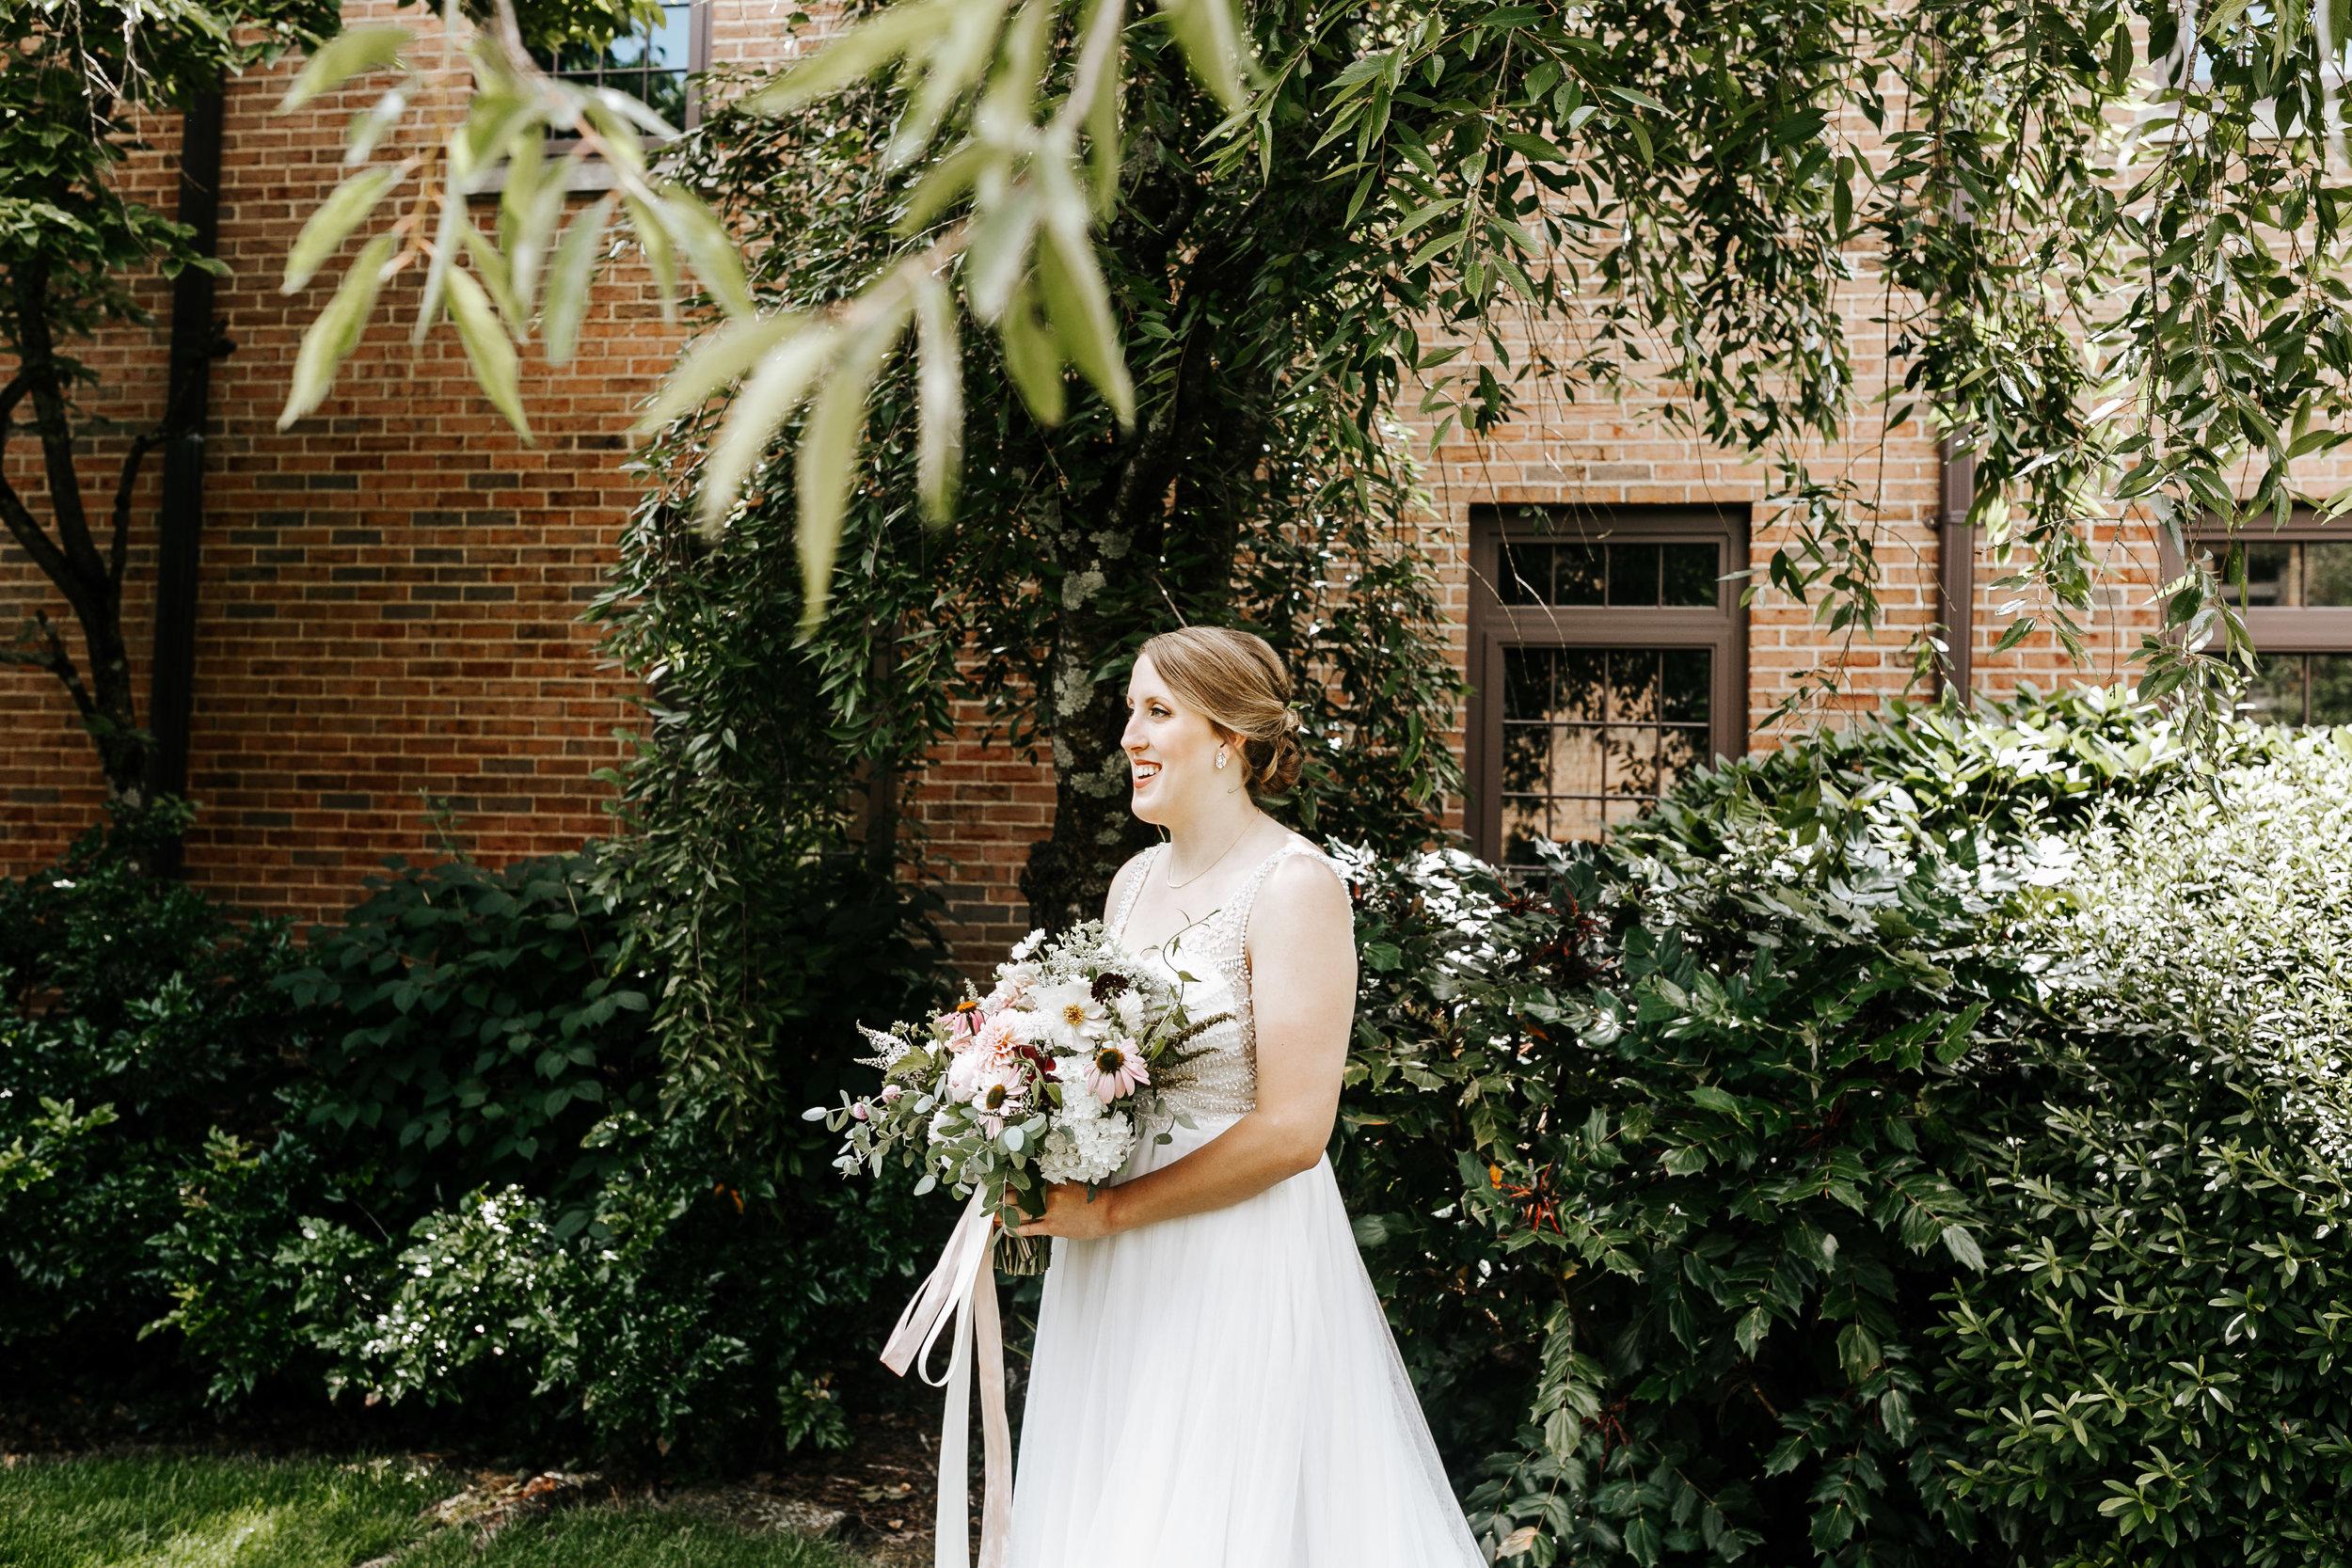 bohemian-photographer-wedding-tennessee-15.jpg